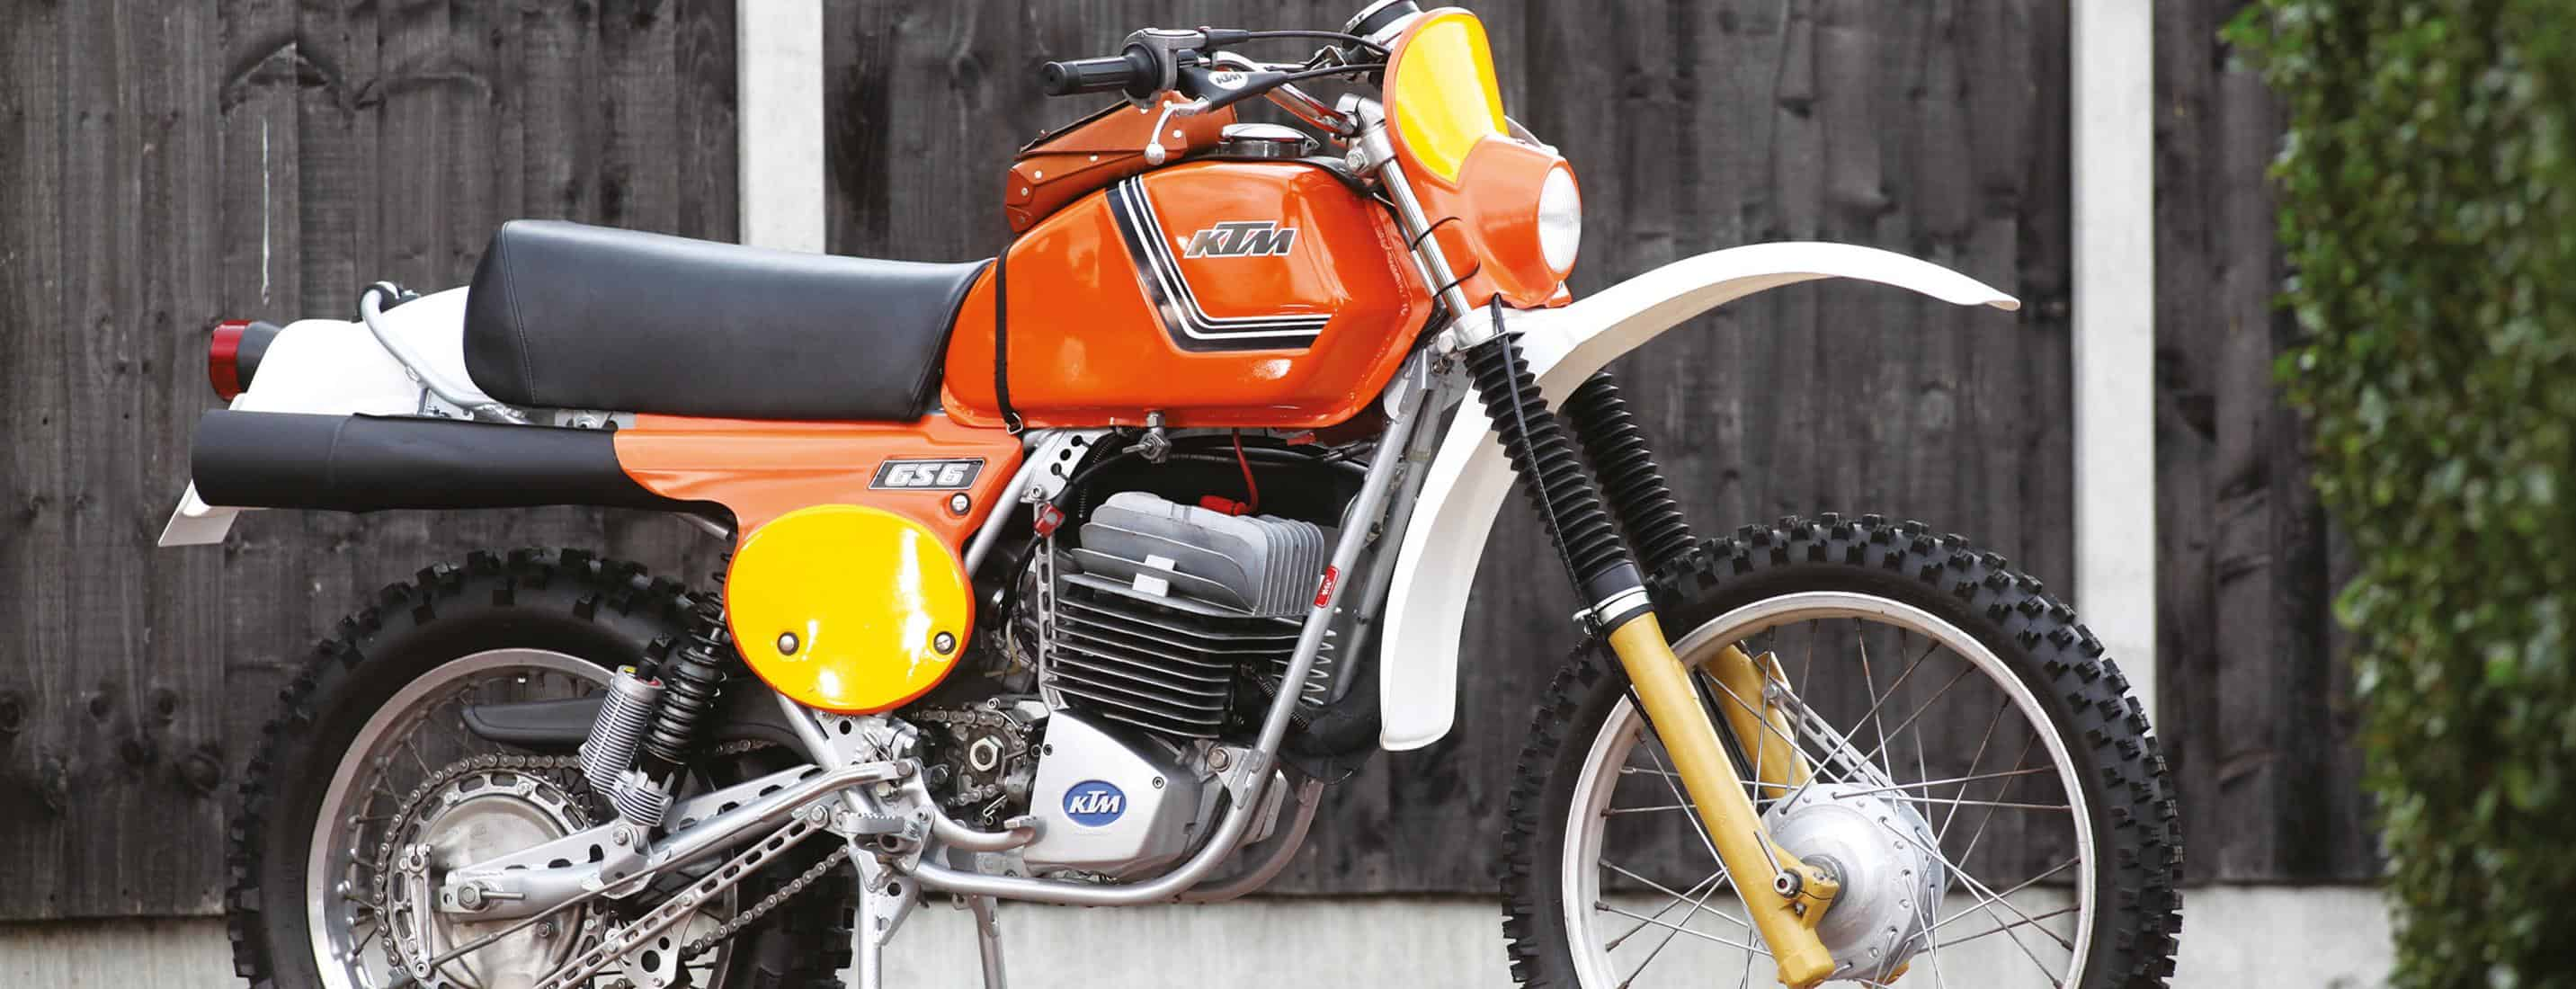 1978 KTM 400 GS6